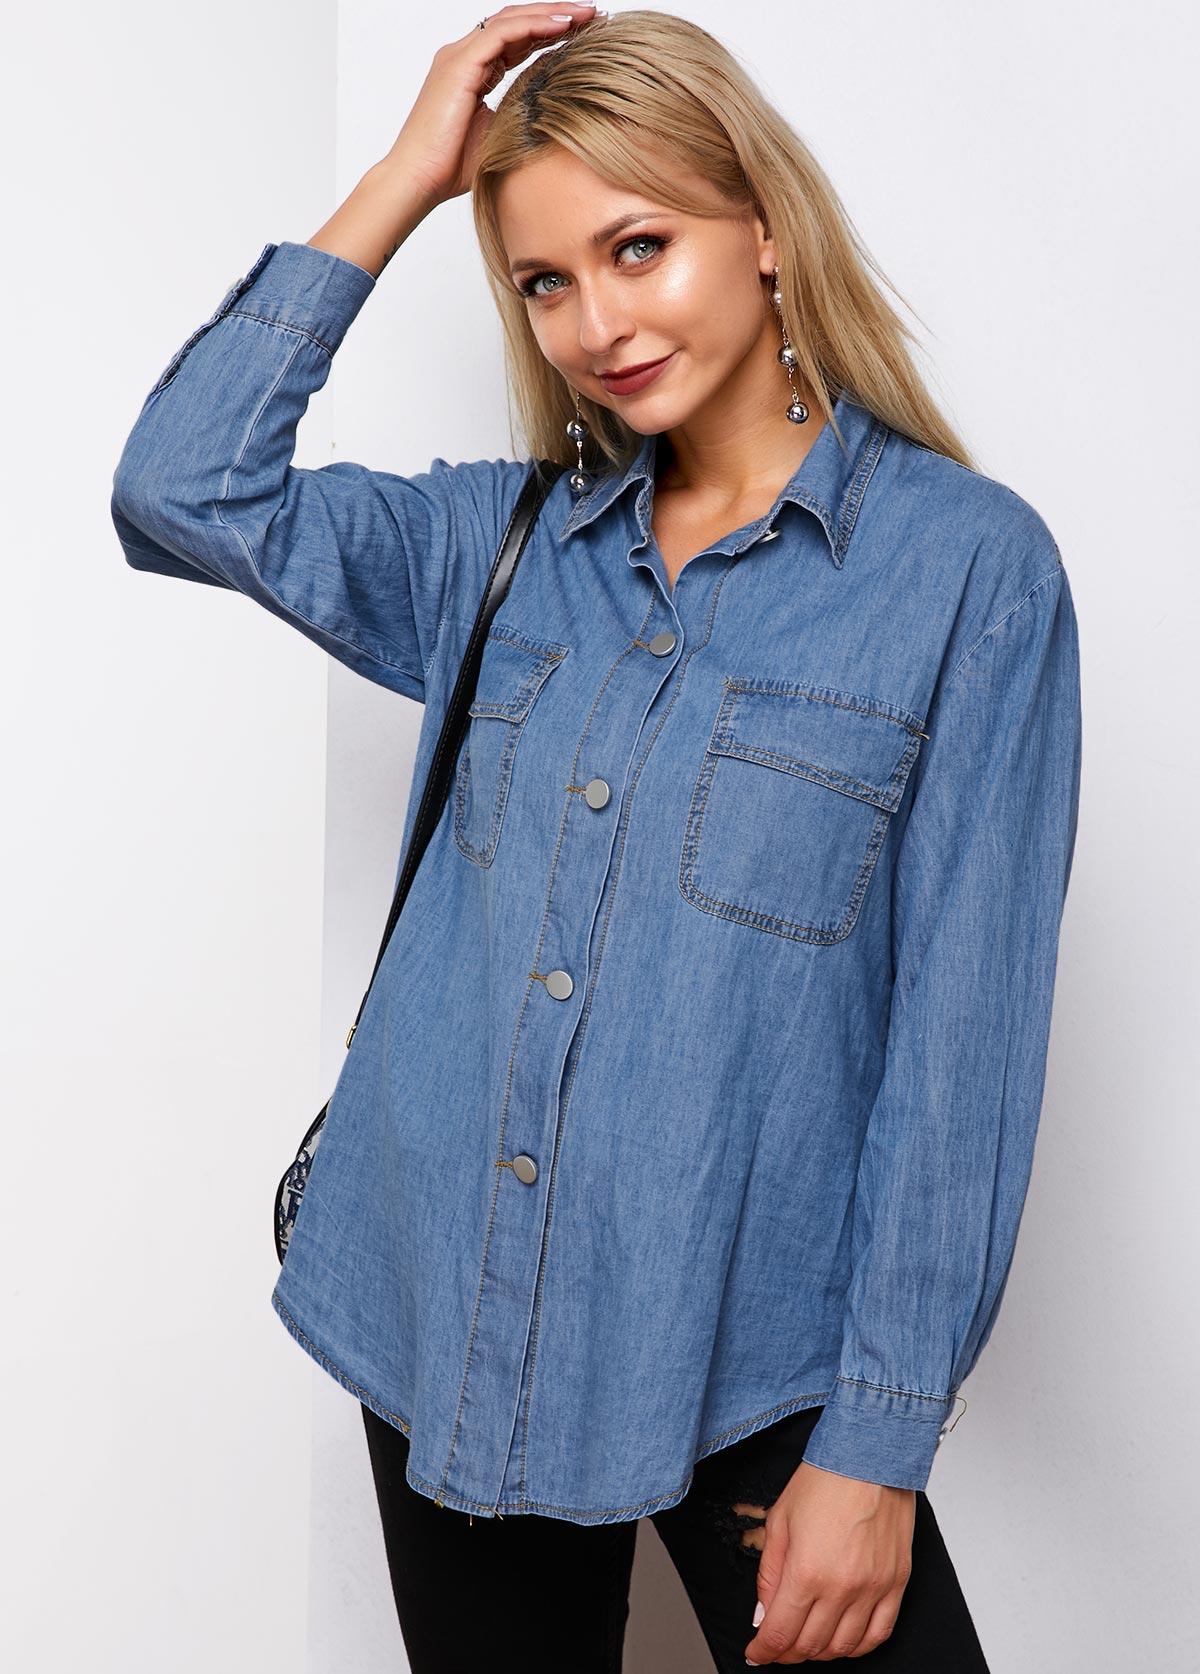 ROTITA Chest Pocket Button Up Denim Shirt